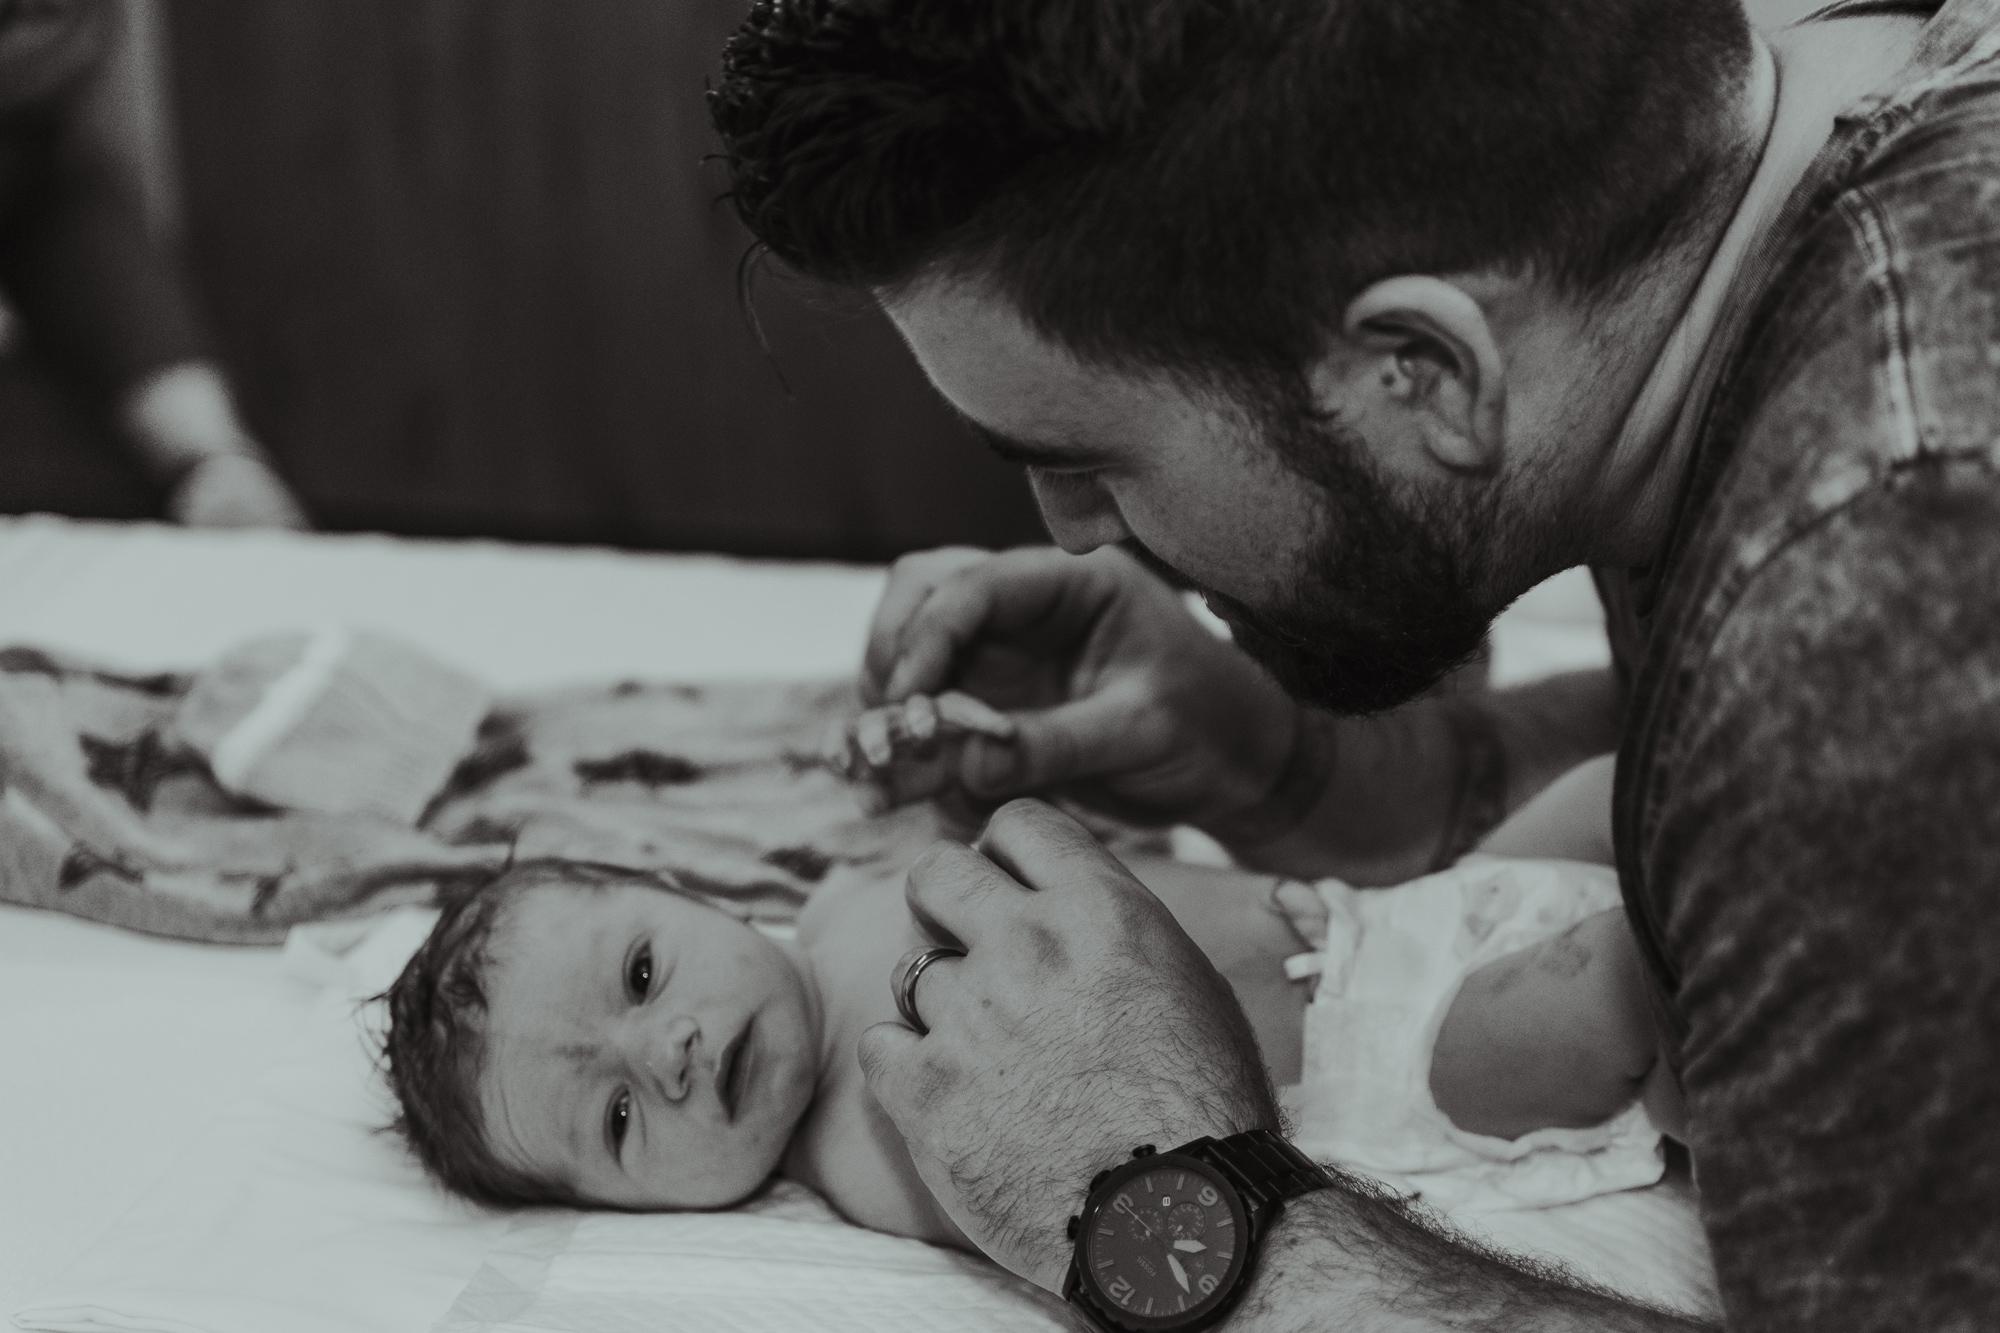 078-birth-photography-palmerston-north-birth-center